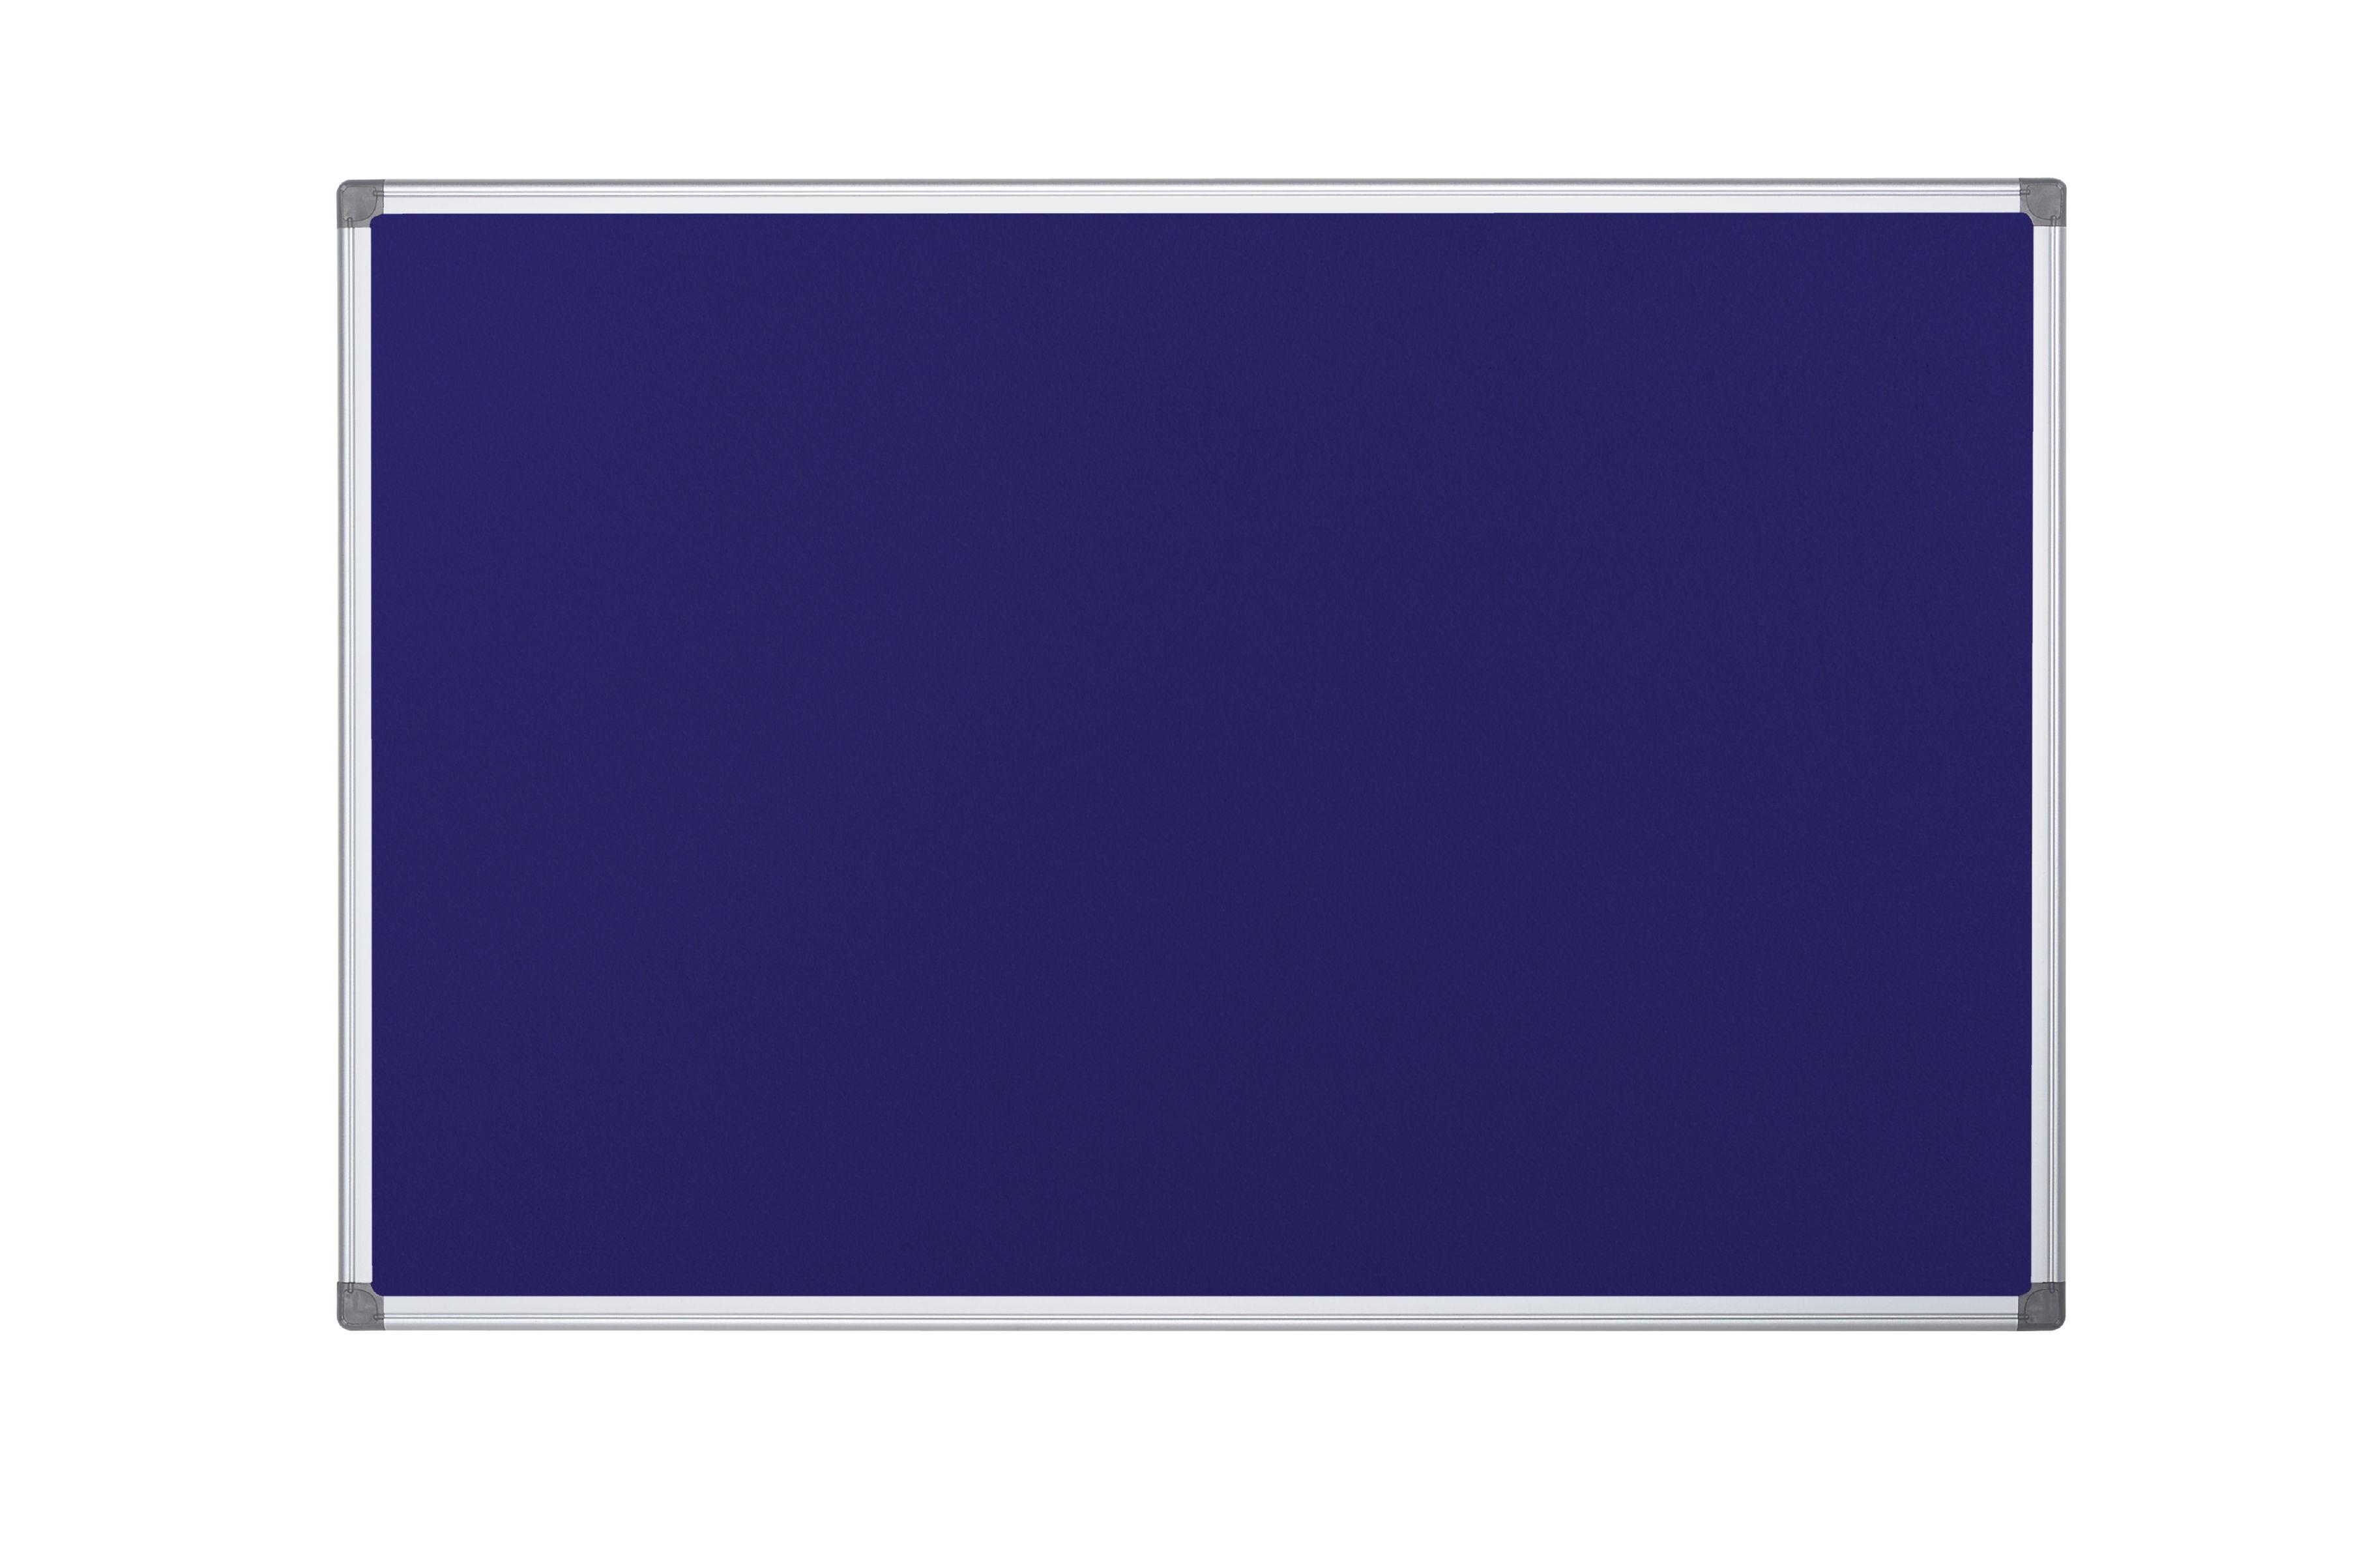 Felt Bi-Office Maya Blue Felt Noticeboard Double Sided Aluminium Frame 900x900mm